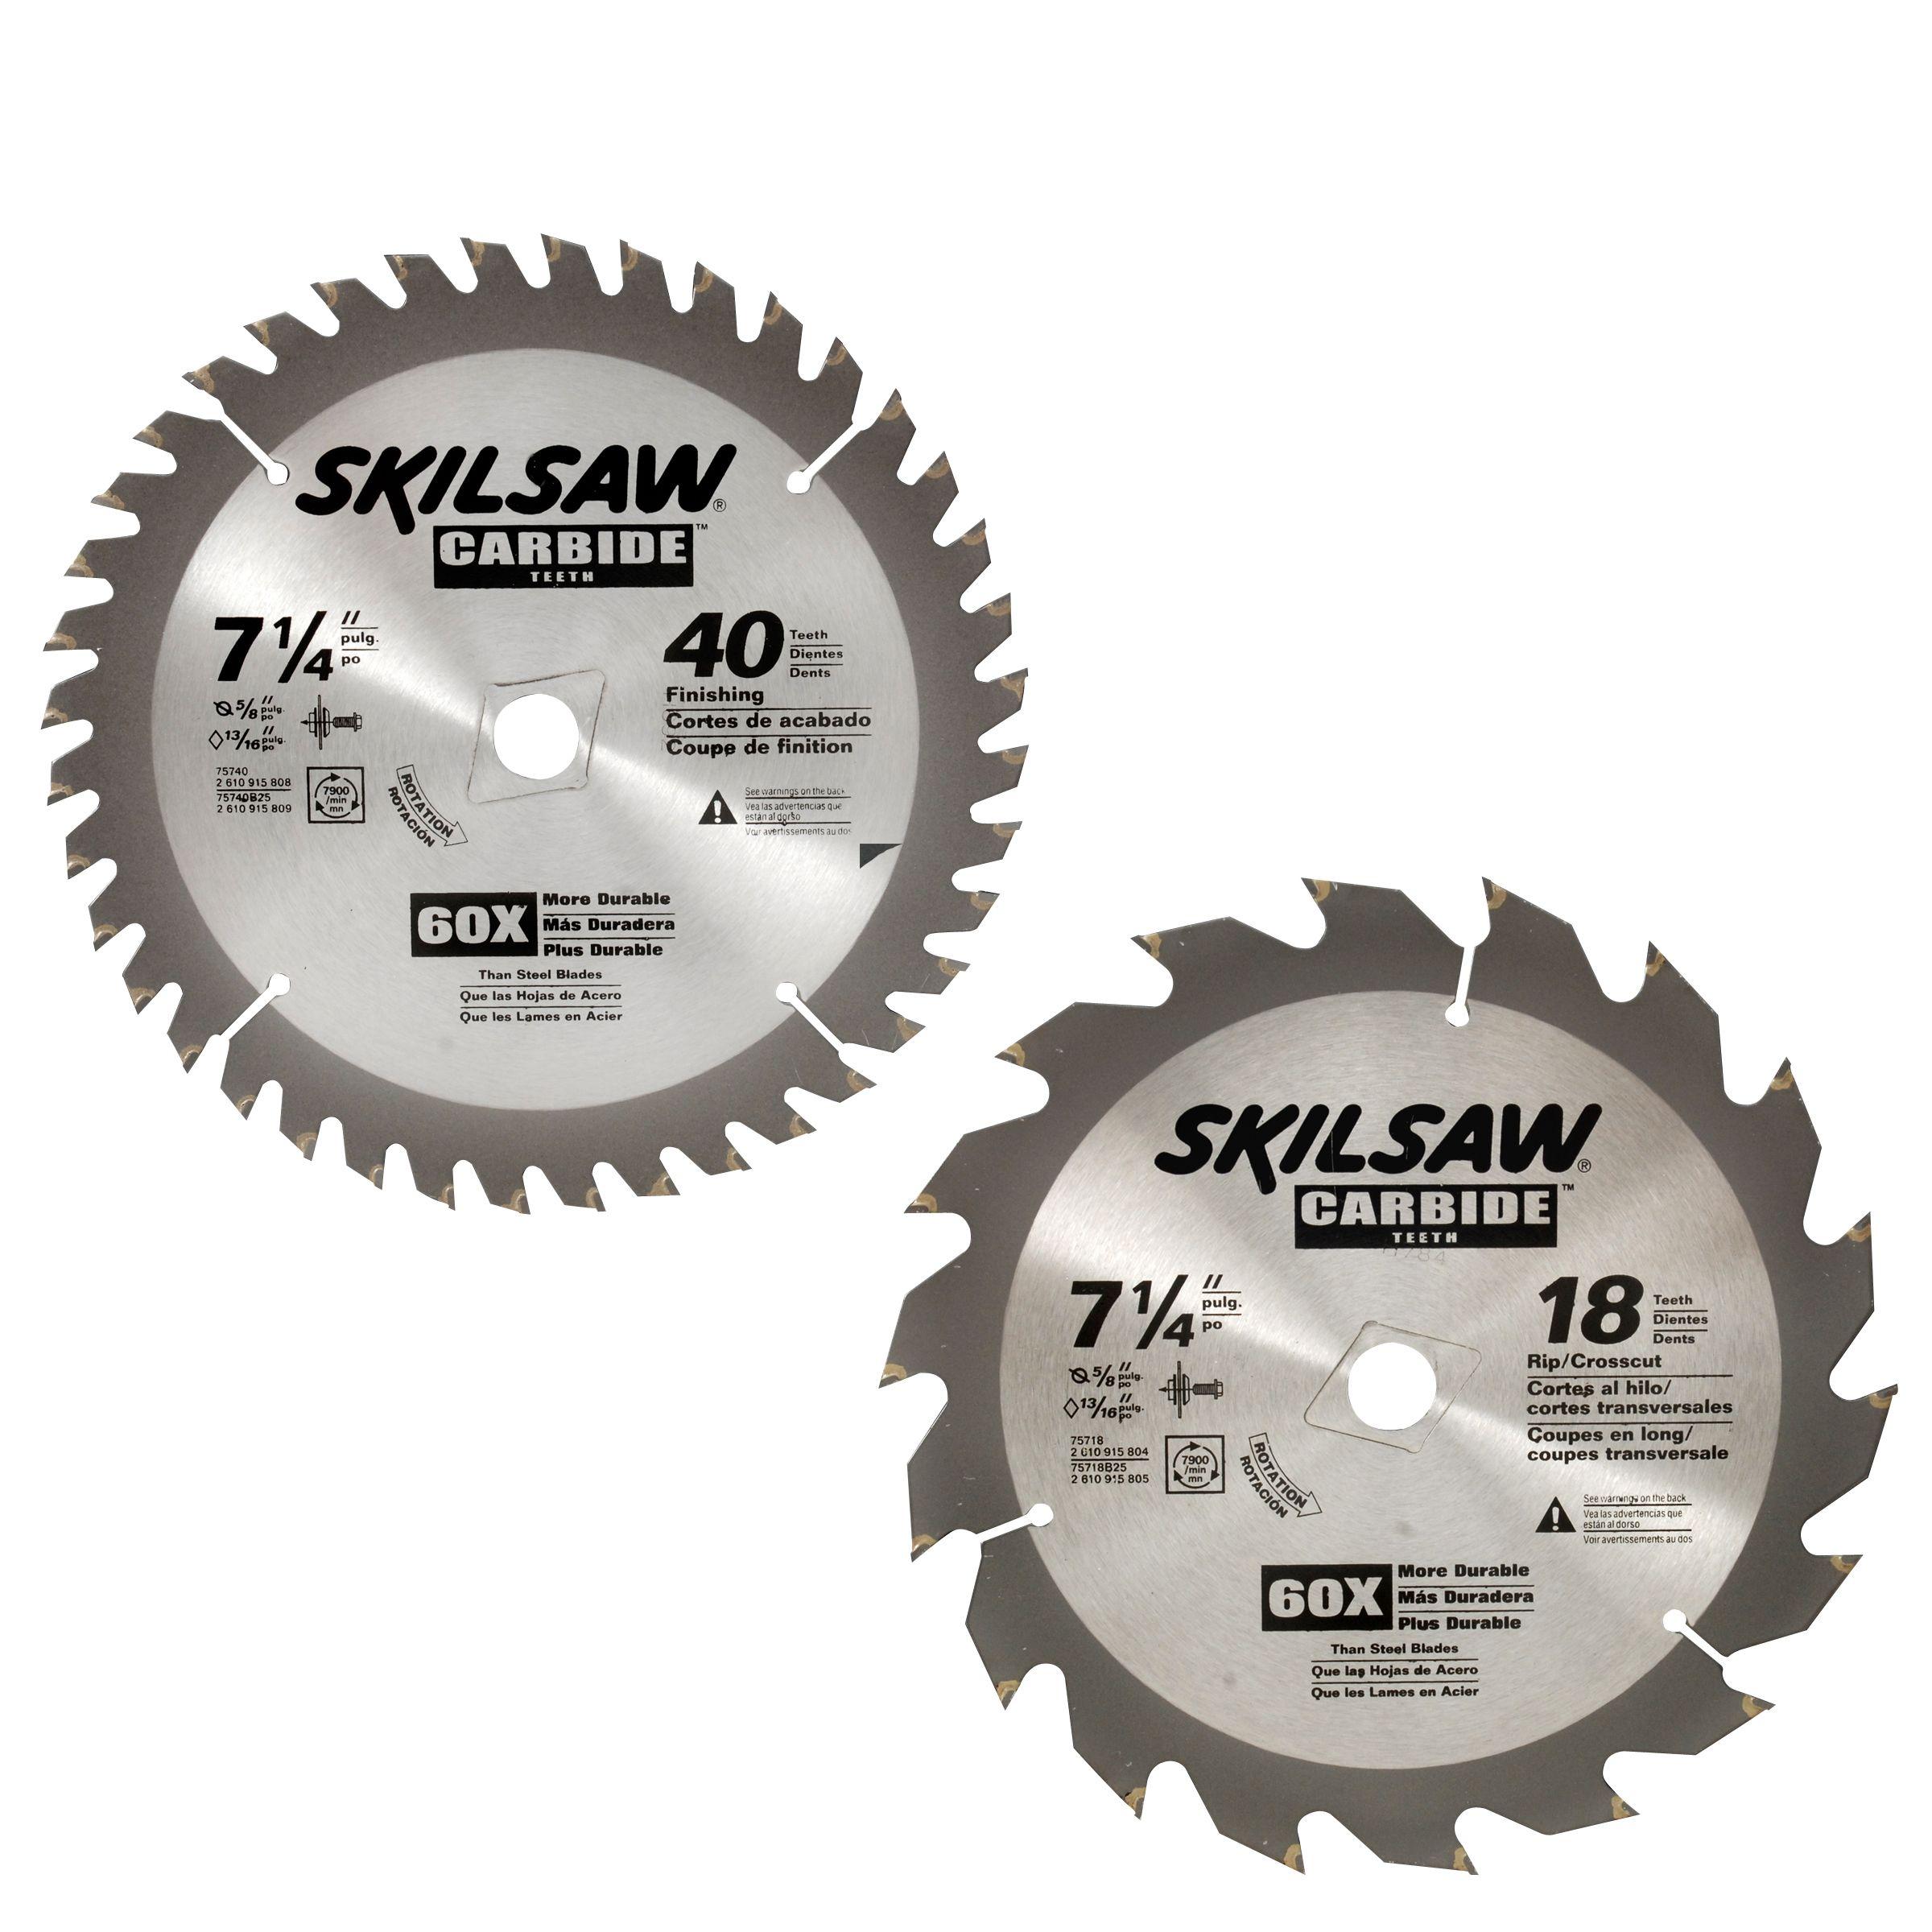 Skil 7-1/4 in. 40T/18T Carbide Circular Saw Blades, 2 pk.